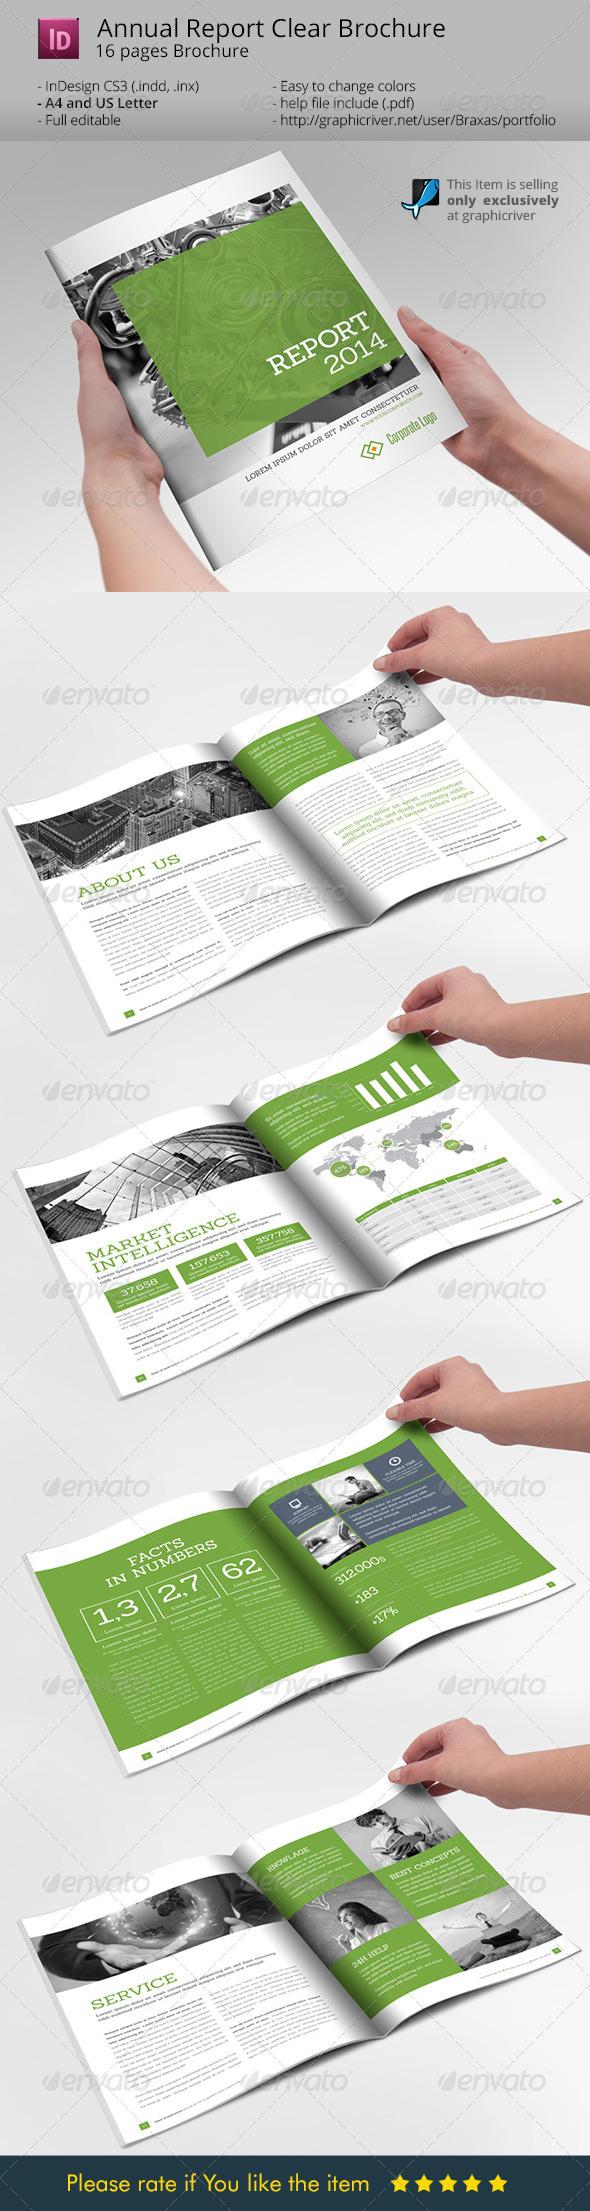 annual report clean indesign brochure graphicriver. Black Bedroom Furniture Sets. Home Design Ideas